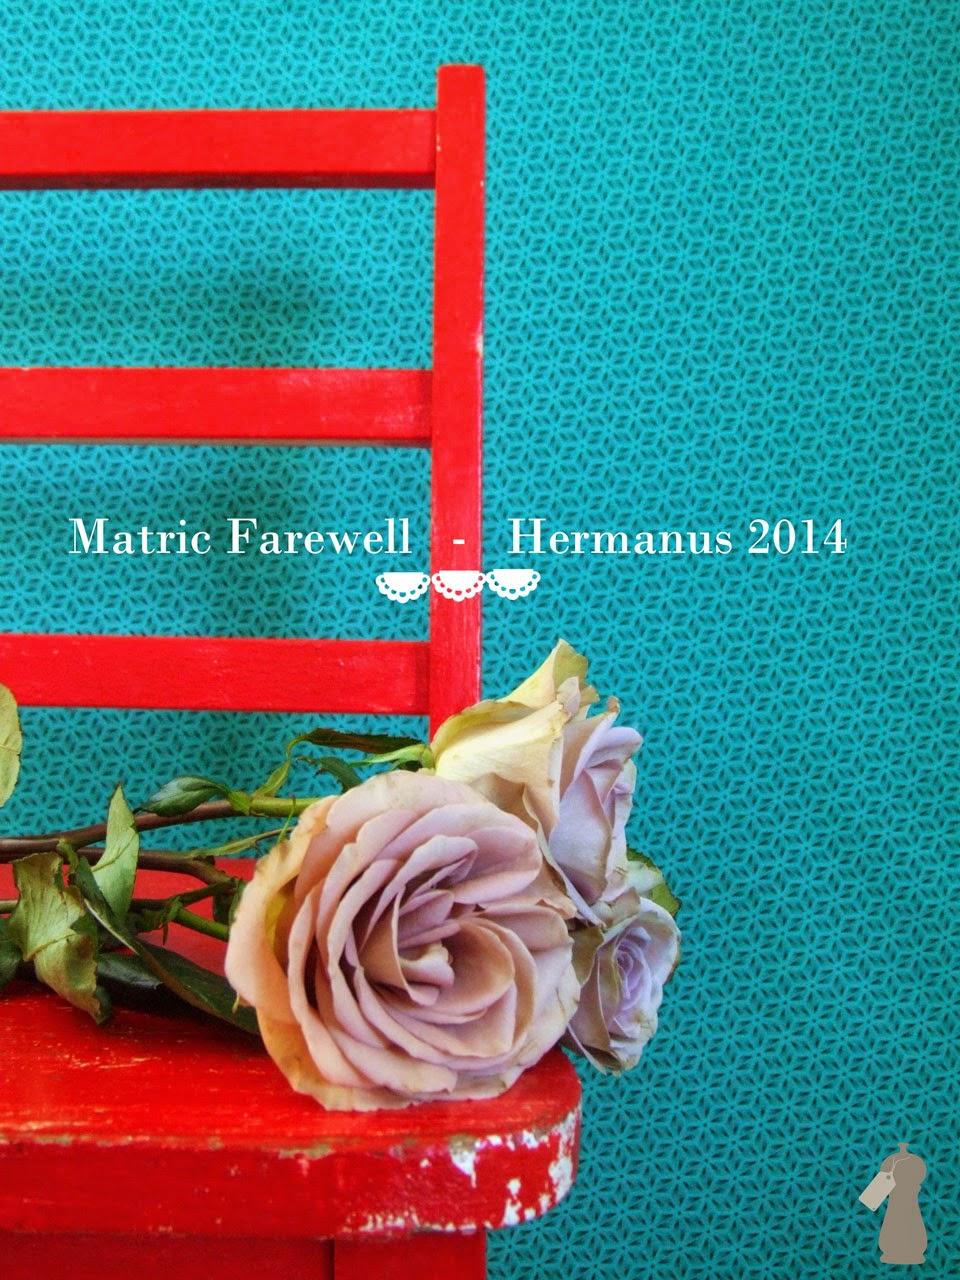 Matric Farewell Prom Make Up: BlackPEPPERcollective: Hermanus, Matric Farewell 2014